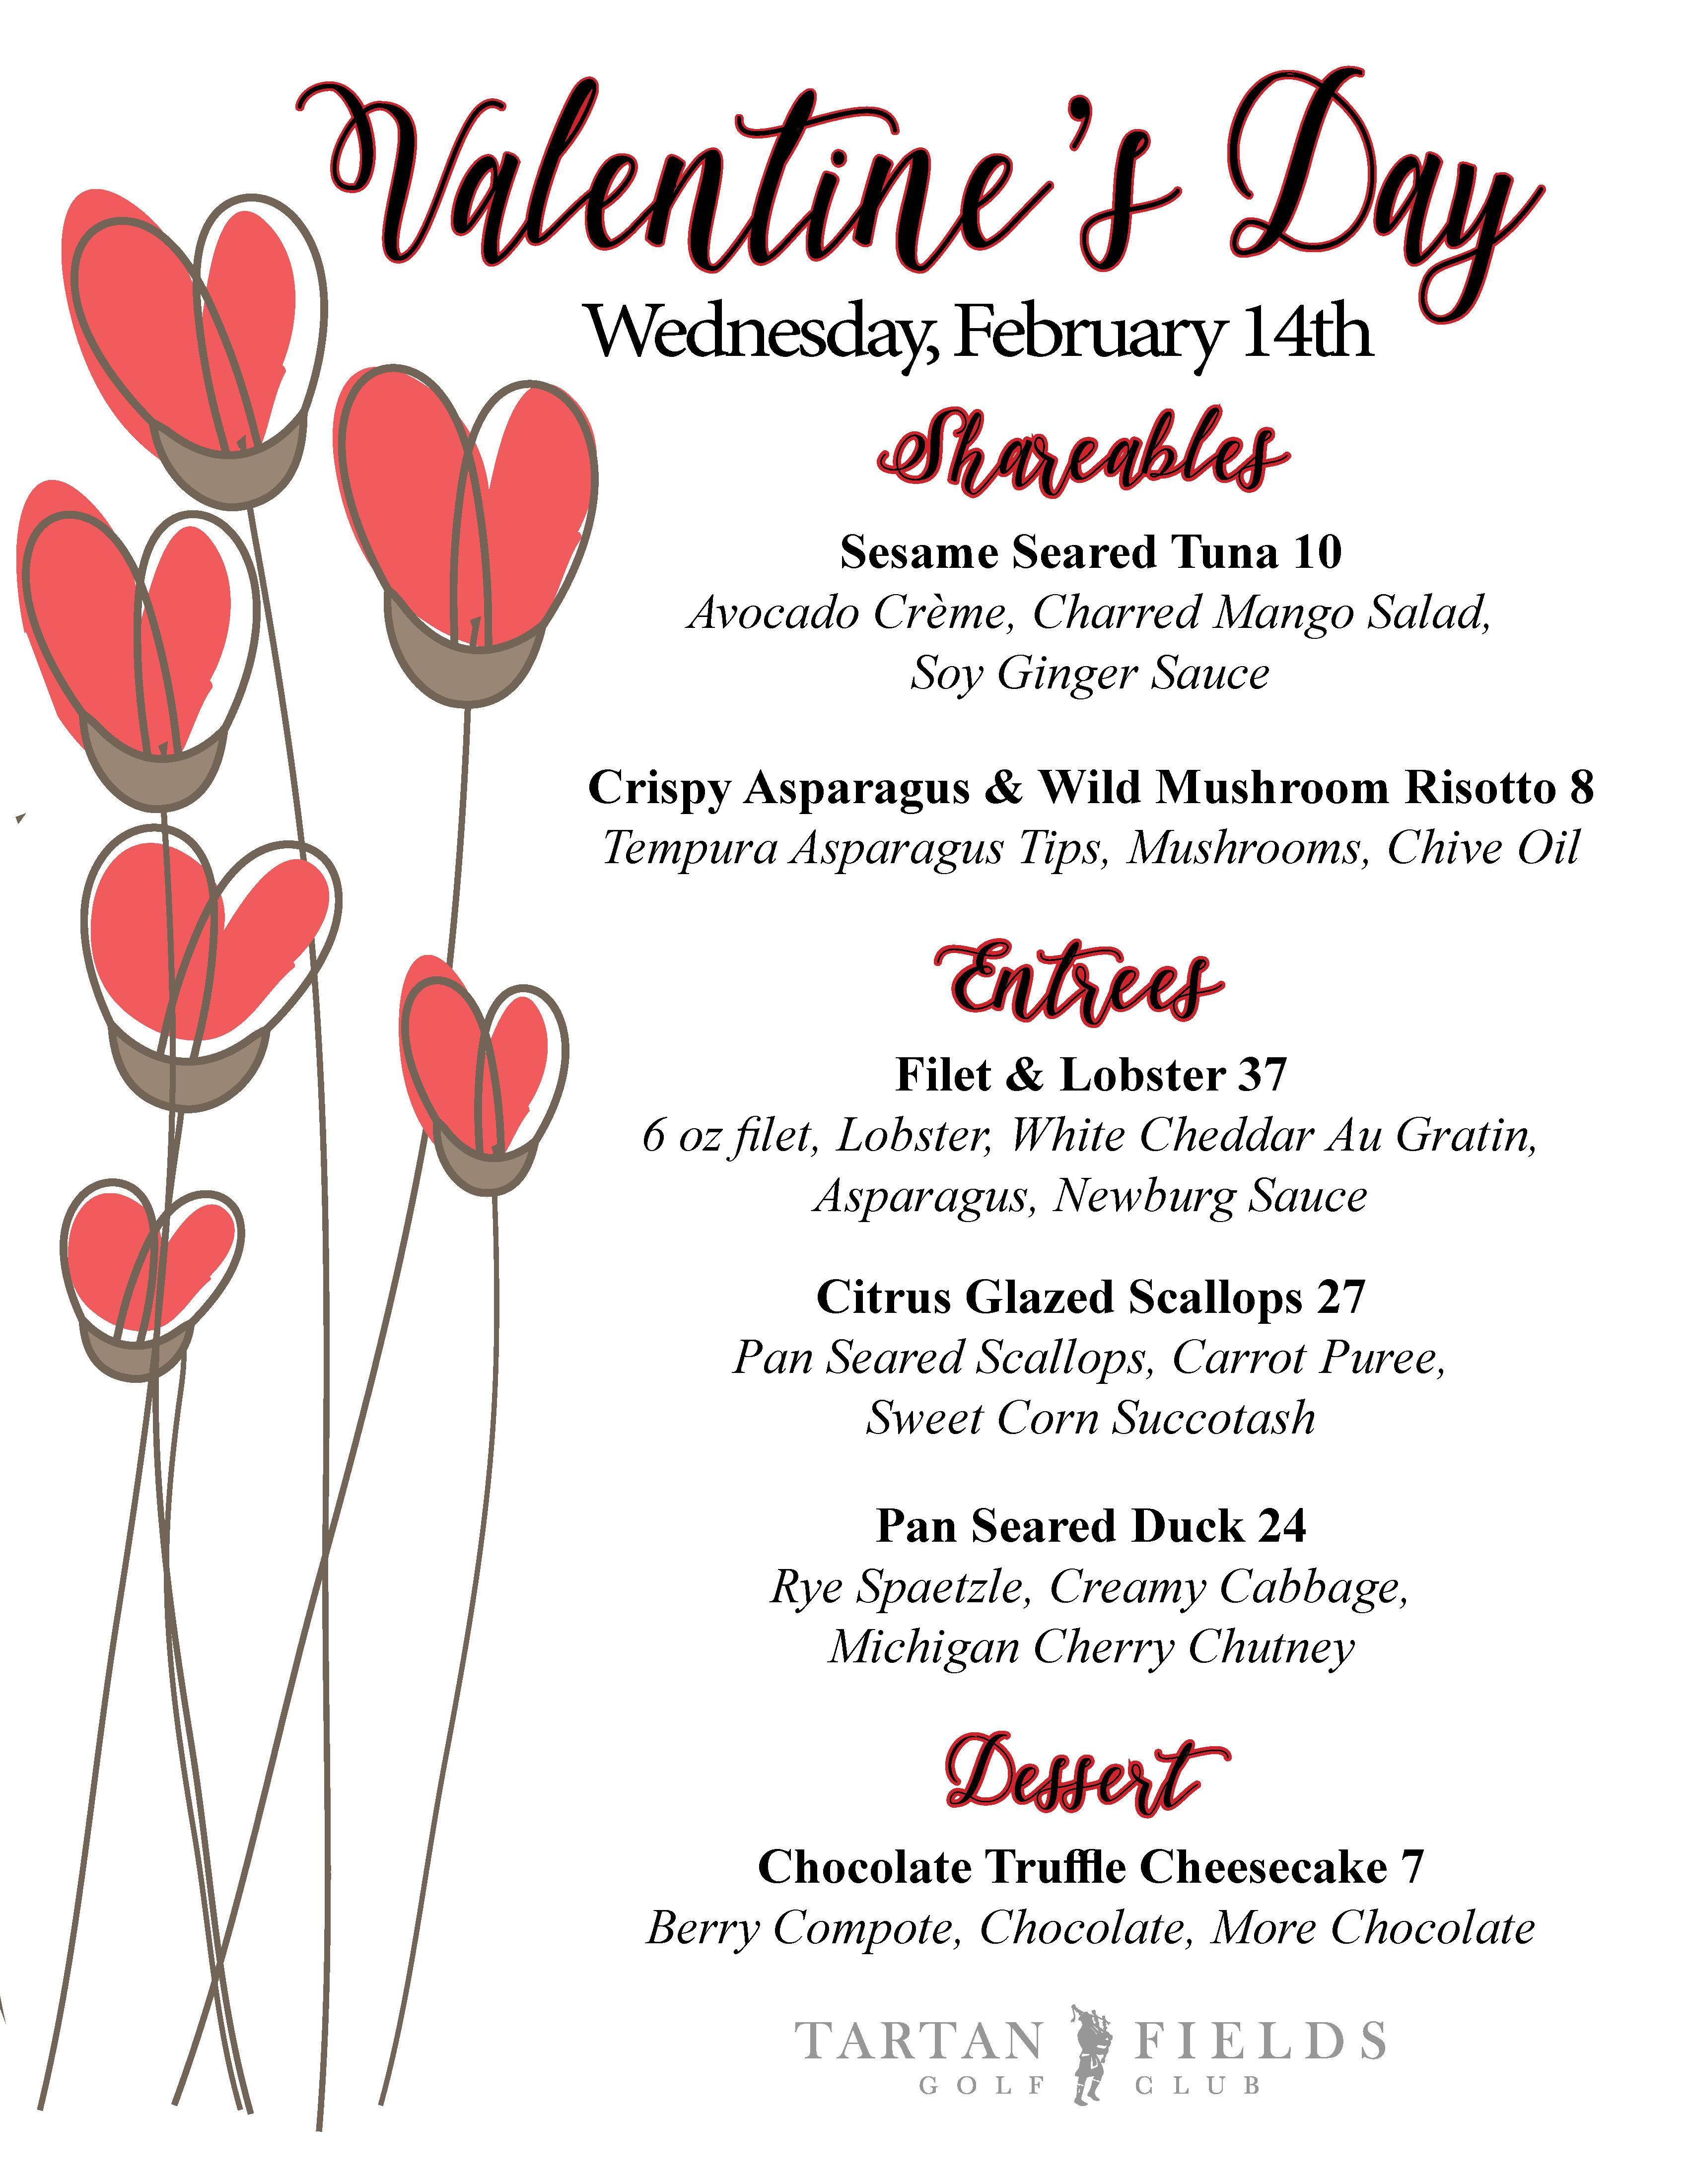 Valentine S Day Dinner The Club At Tartan Fields 2018 02 14